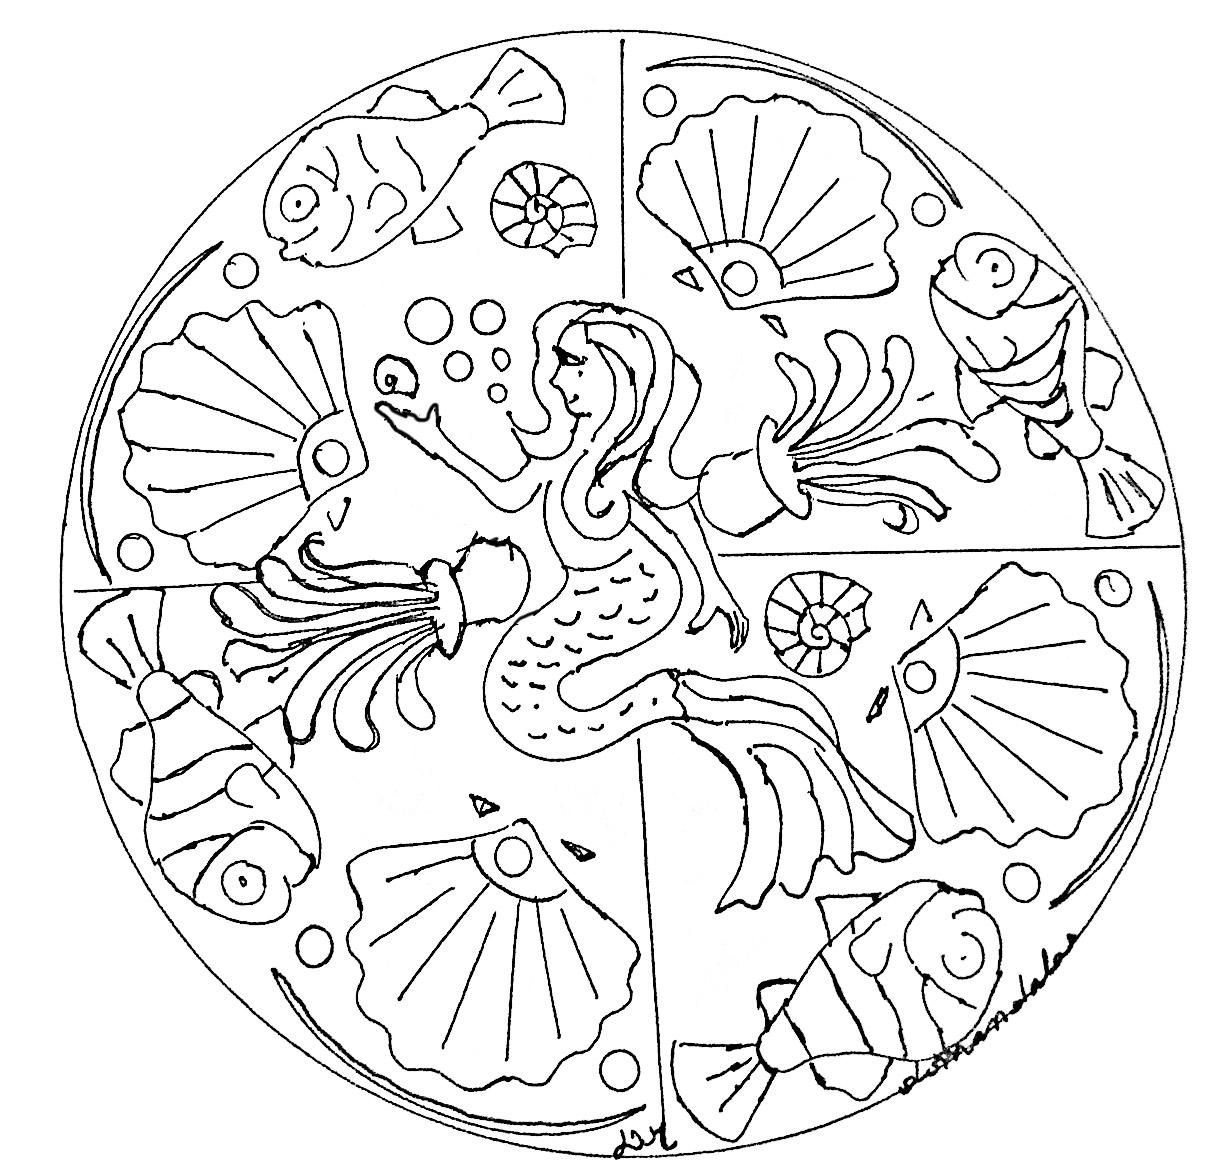 Mandala a imprimer sirene mandalas avec personnages - Imprimer coloriage mandala ...